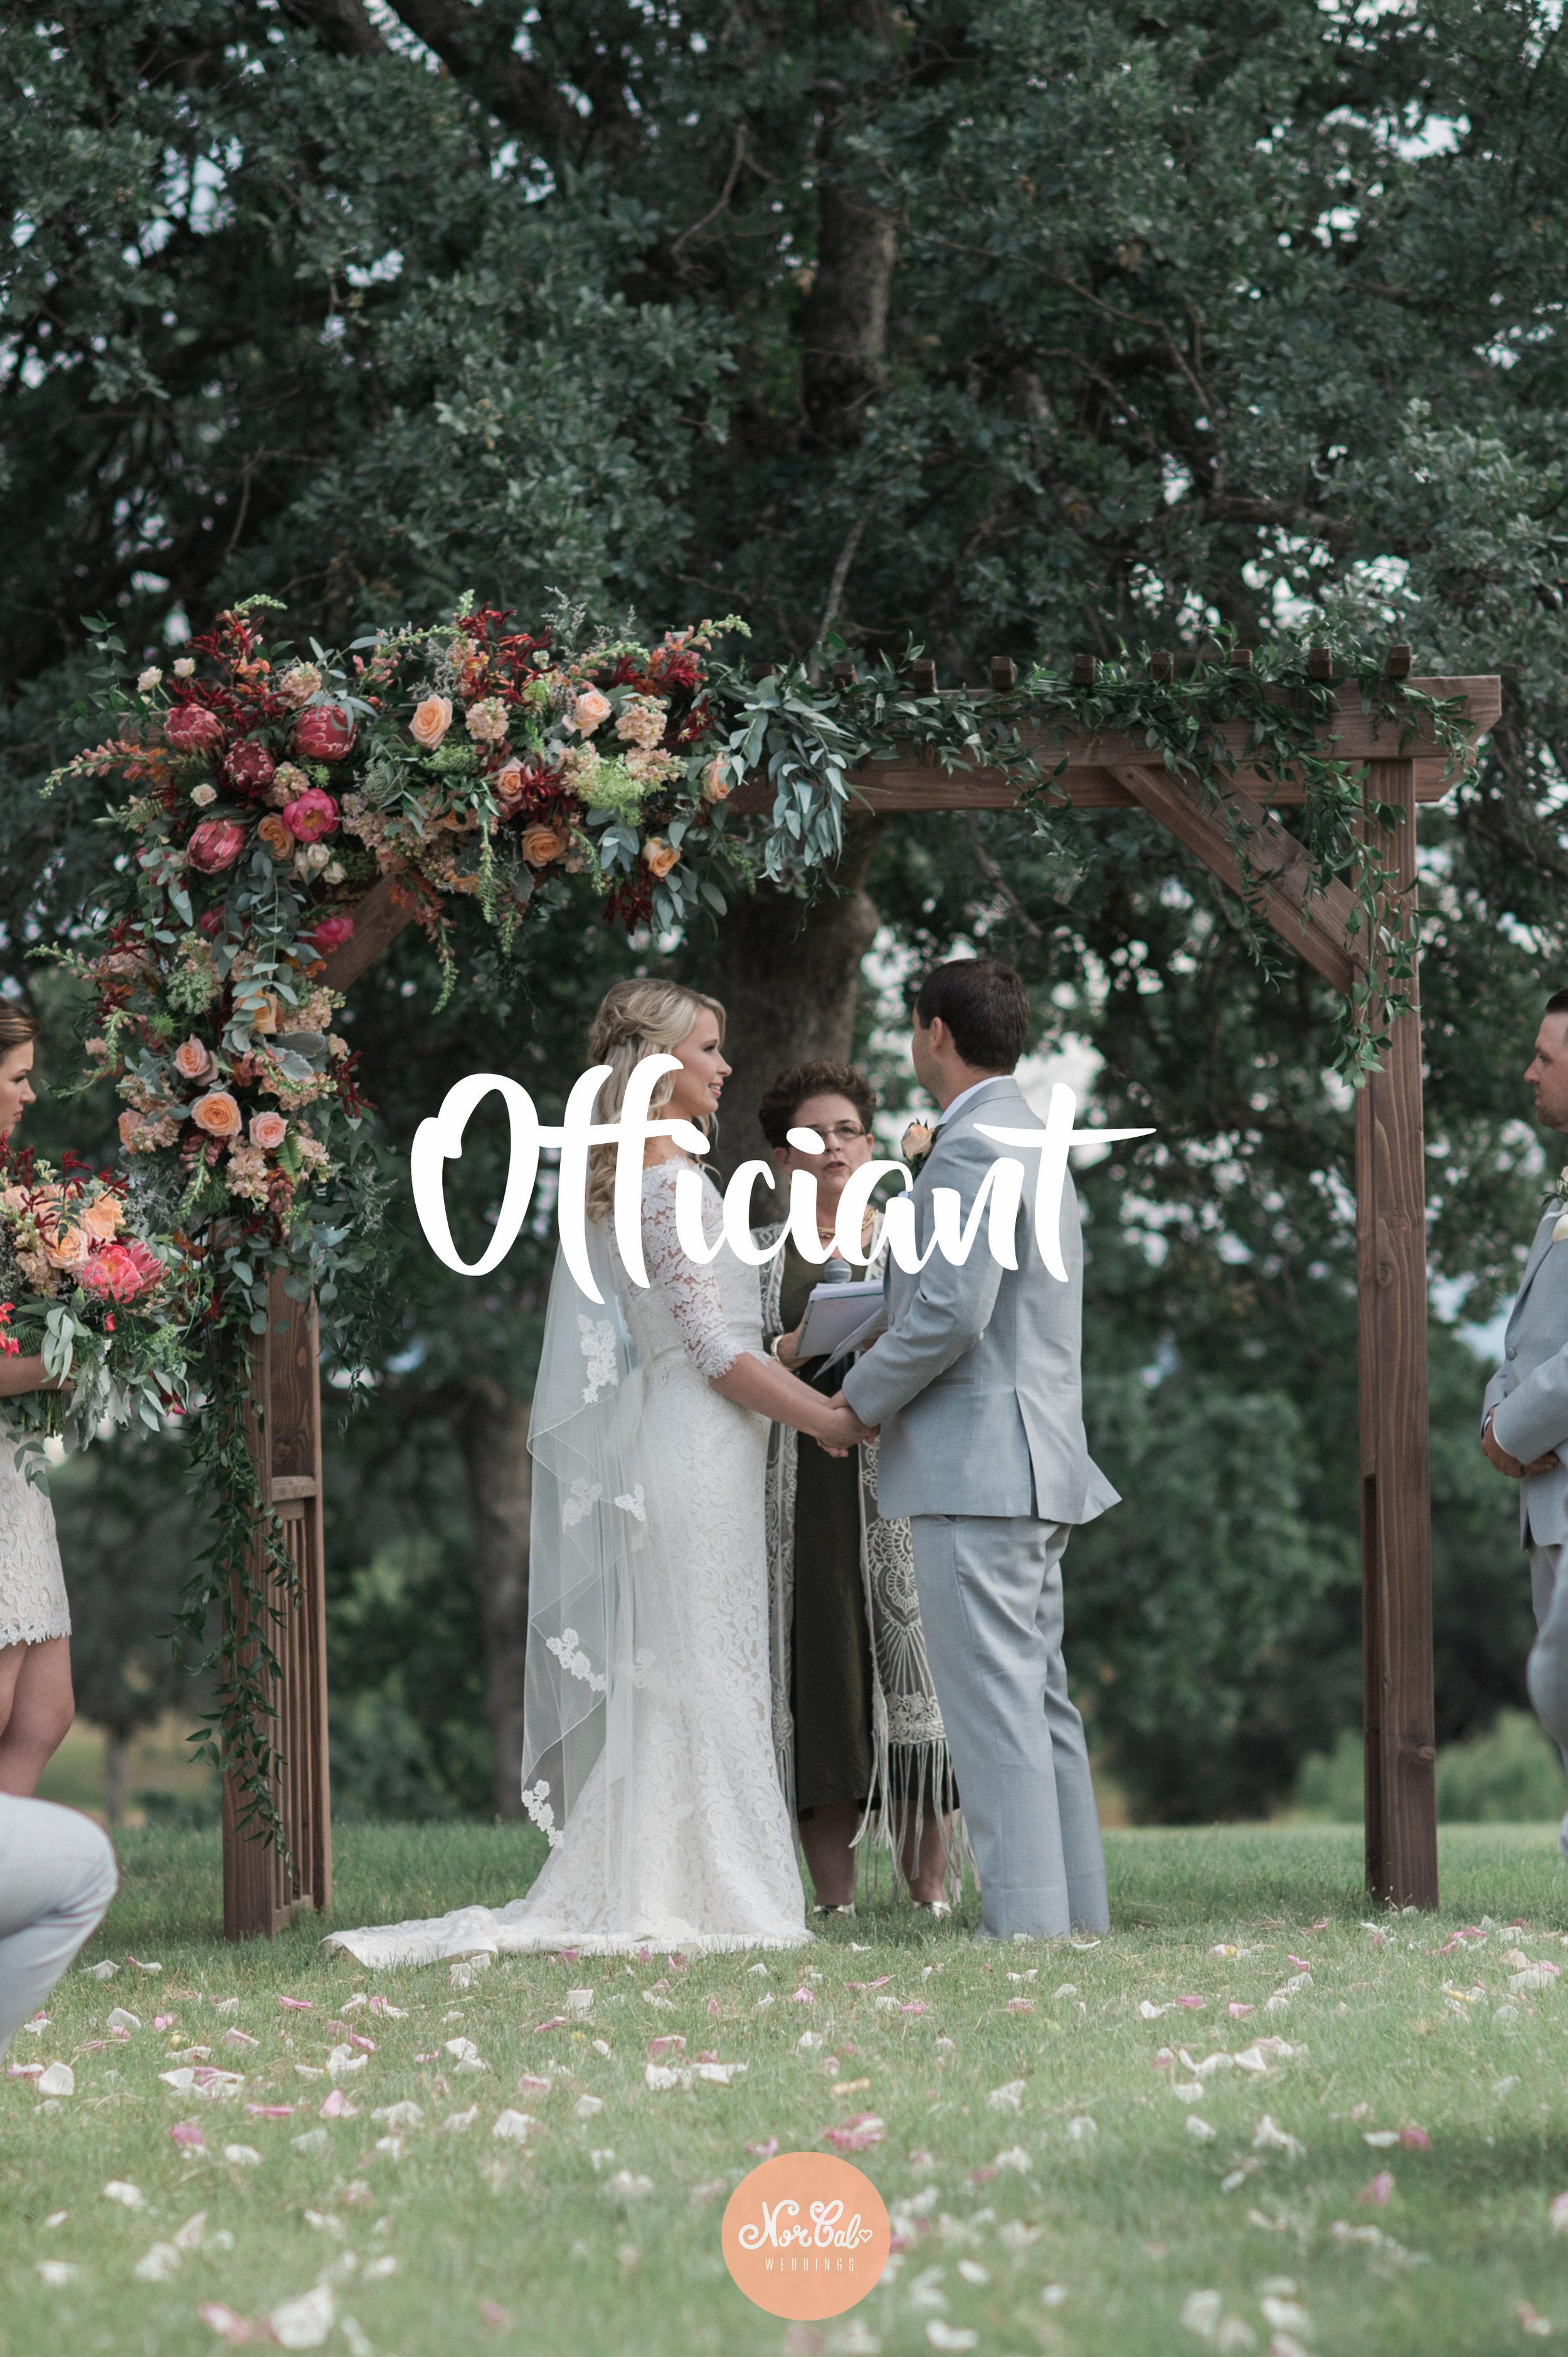 NorCal Weddings Officiant Services.jpg